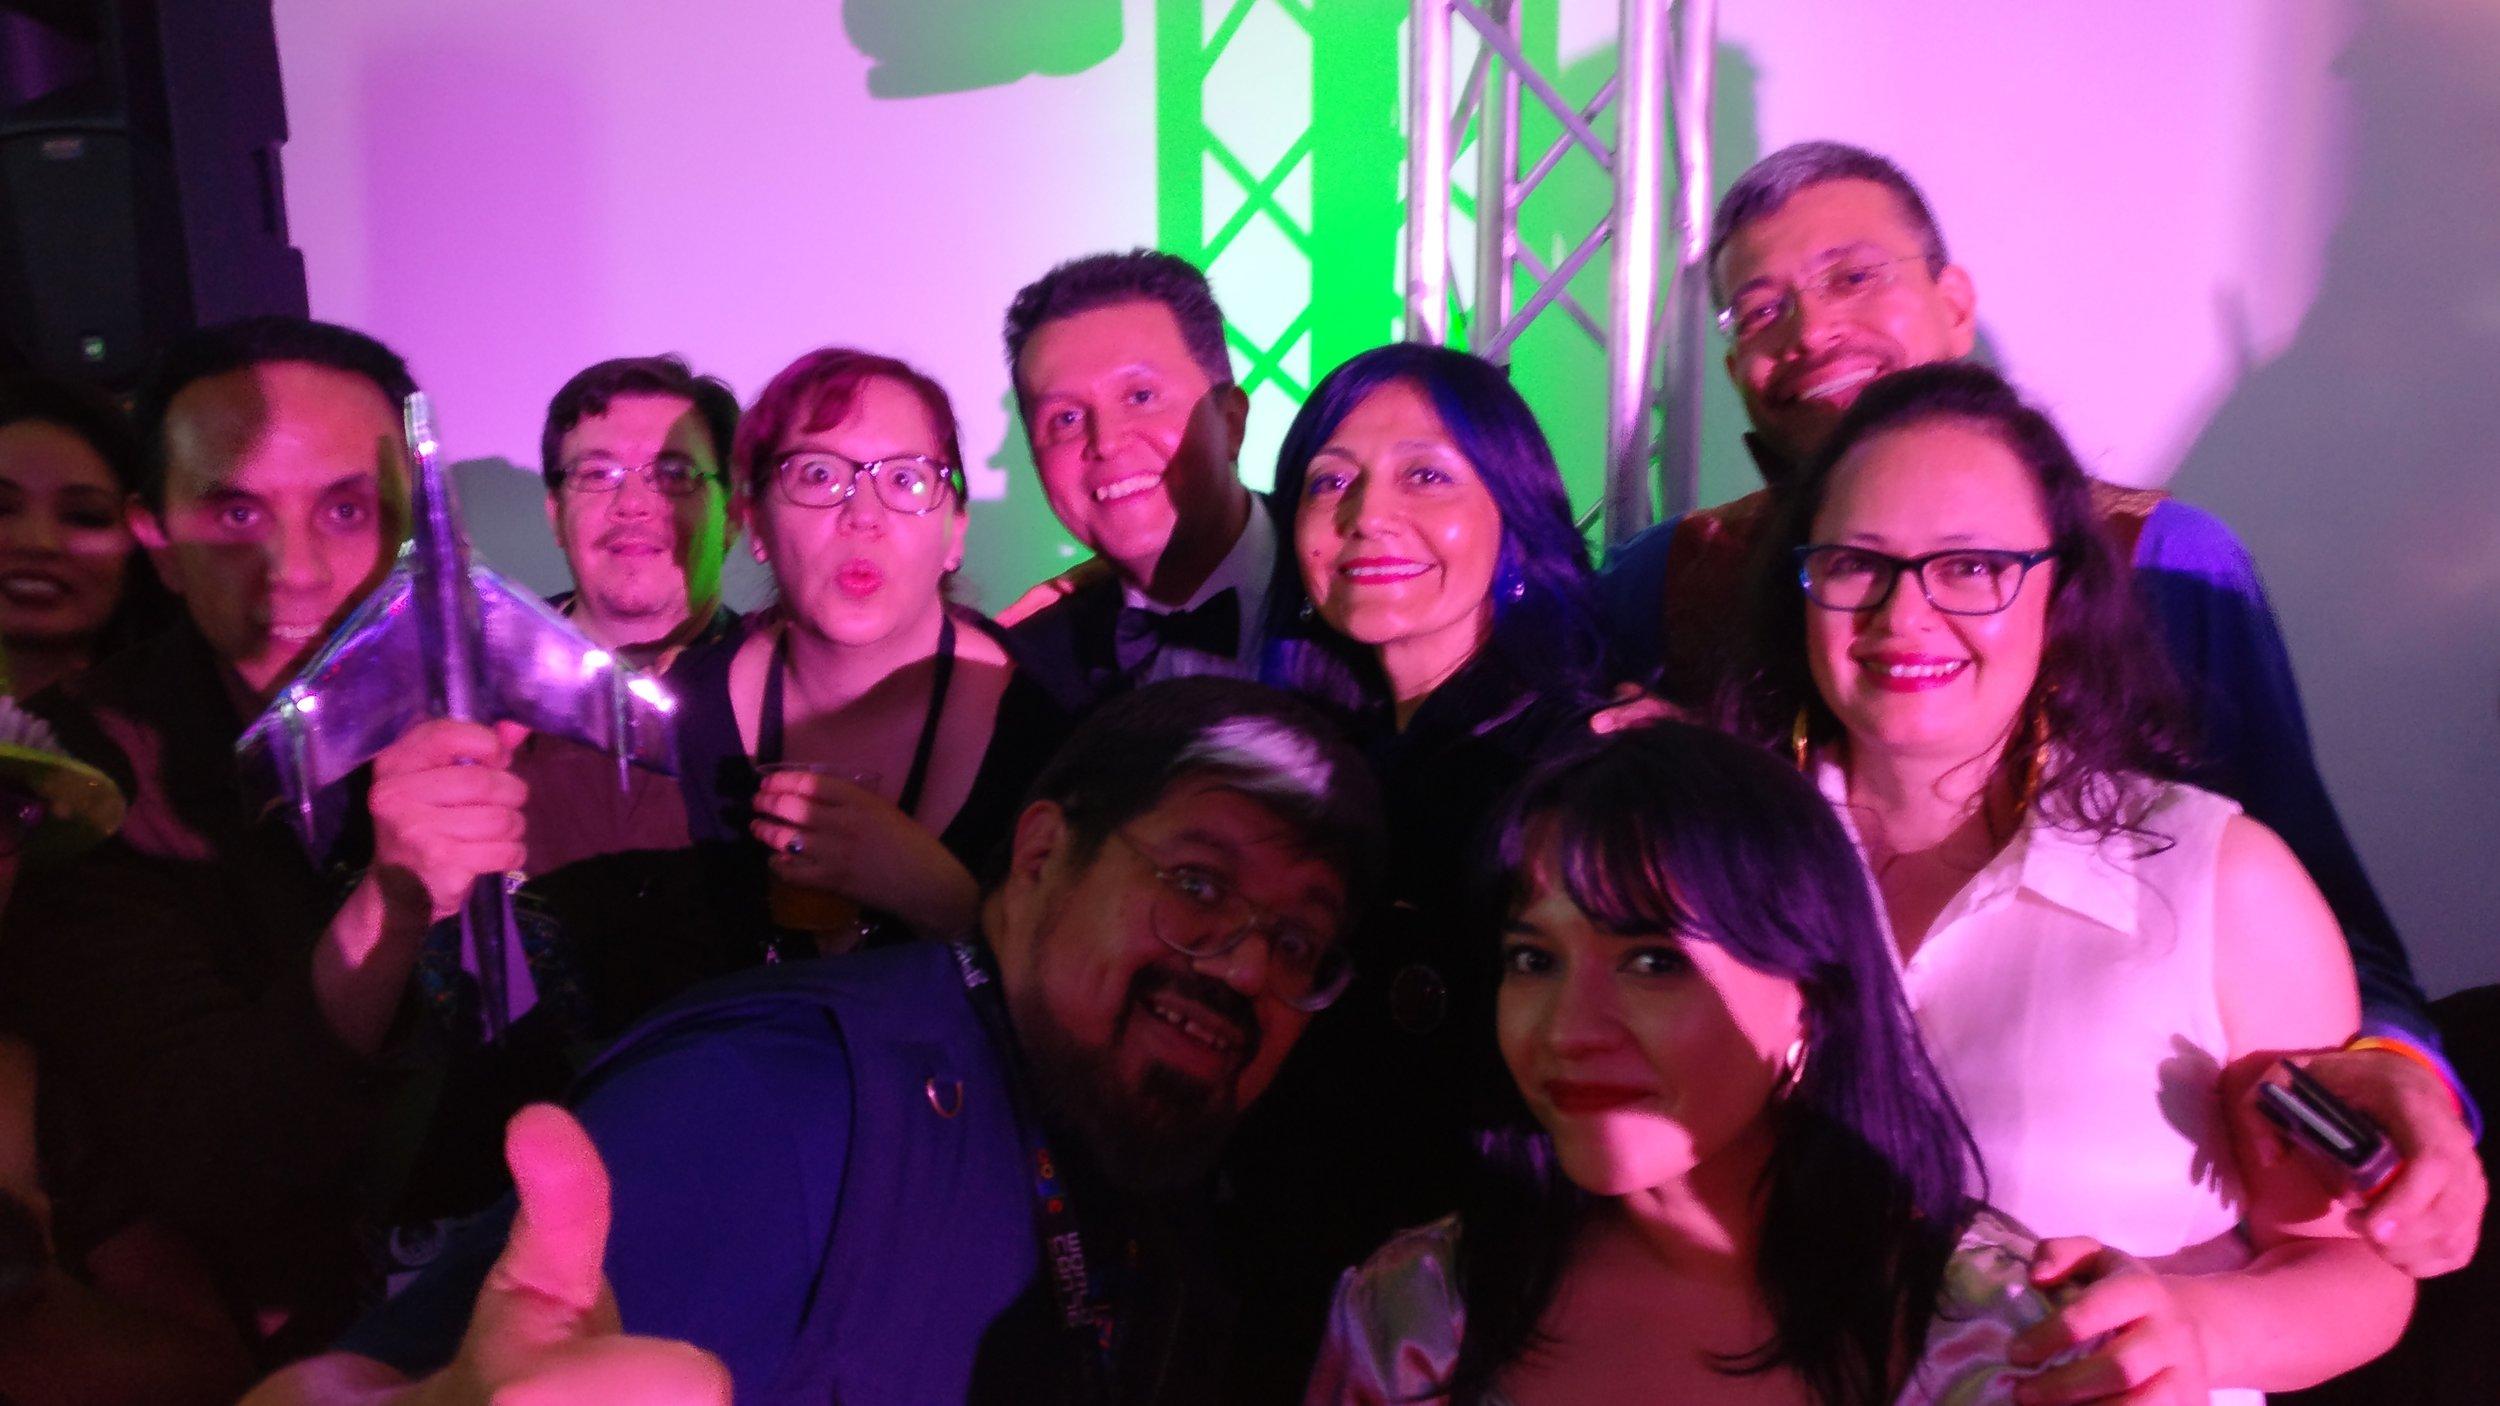 Alberto Chimal holding John Picacio's Alfie Award with David Bowles, Raquel Castro, John Picacio, Patty Garcia, Héctor González, Libia Brenda, Gabriela Damián Miravete, and José Luis Zárate